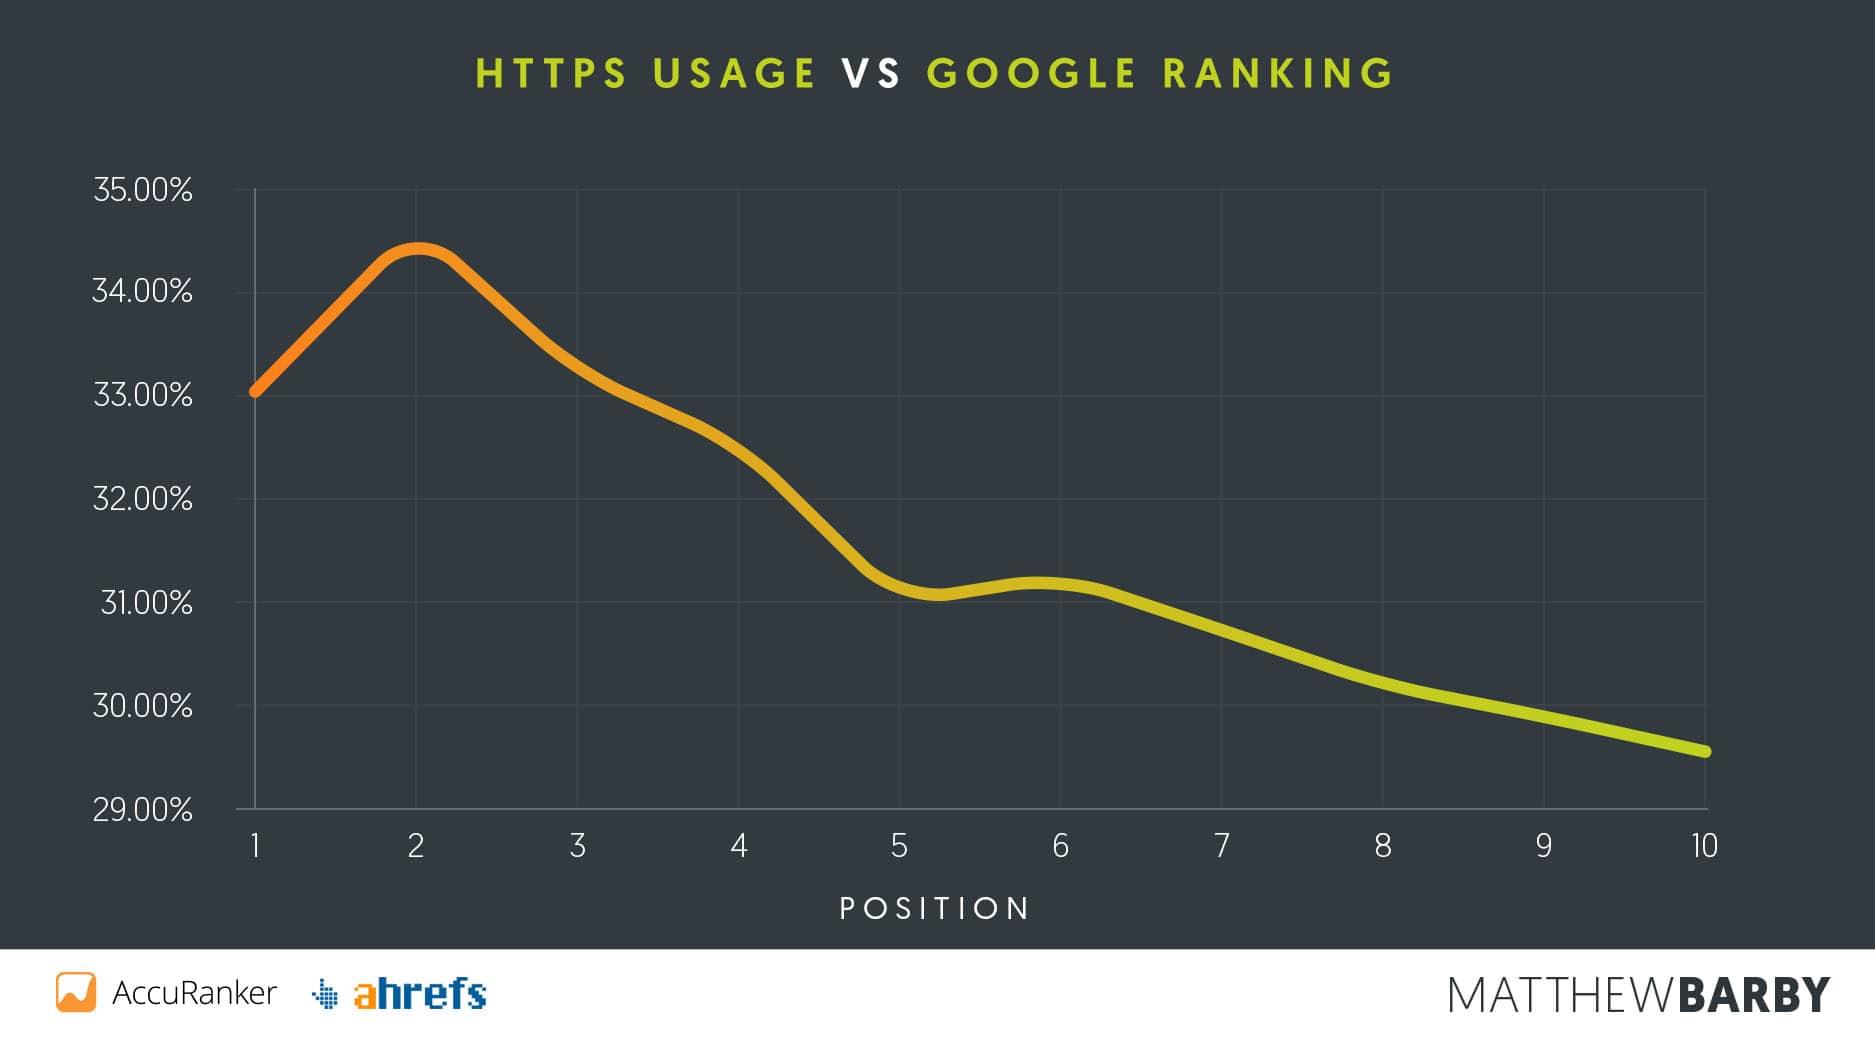 Uso de HTTPS vs. Clasificación de Google